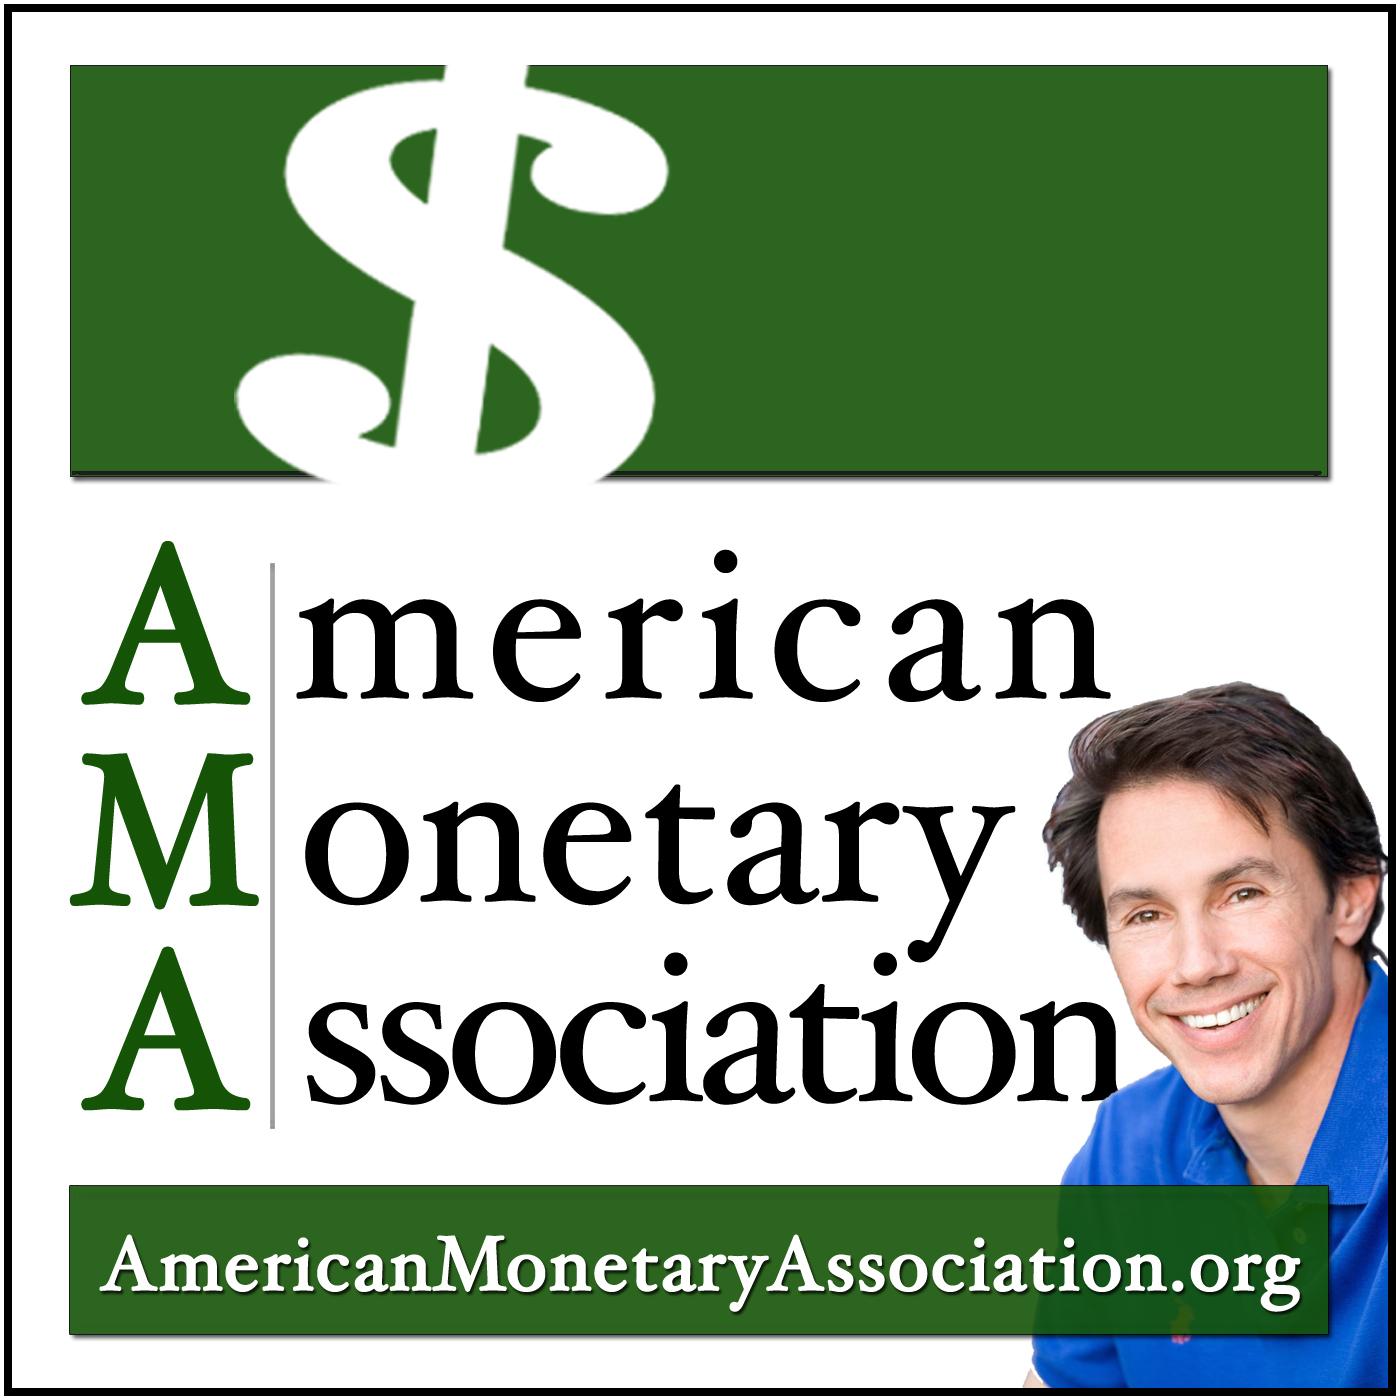 American Monetary Association logo